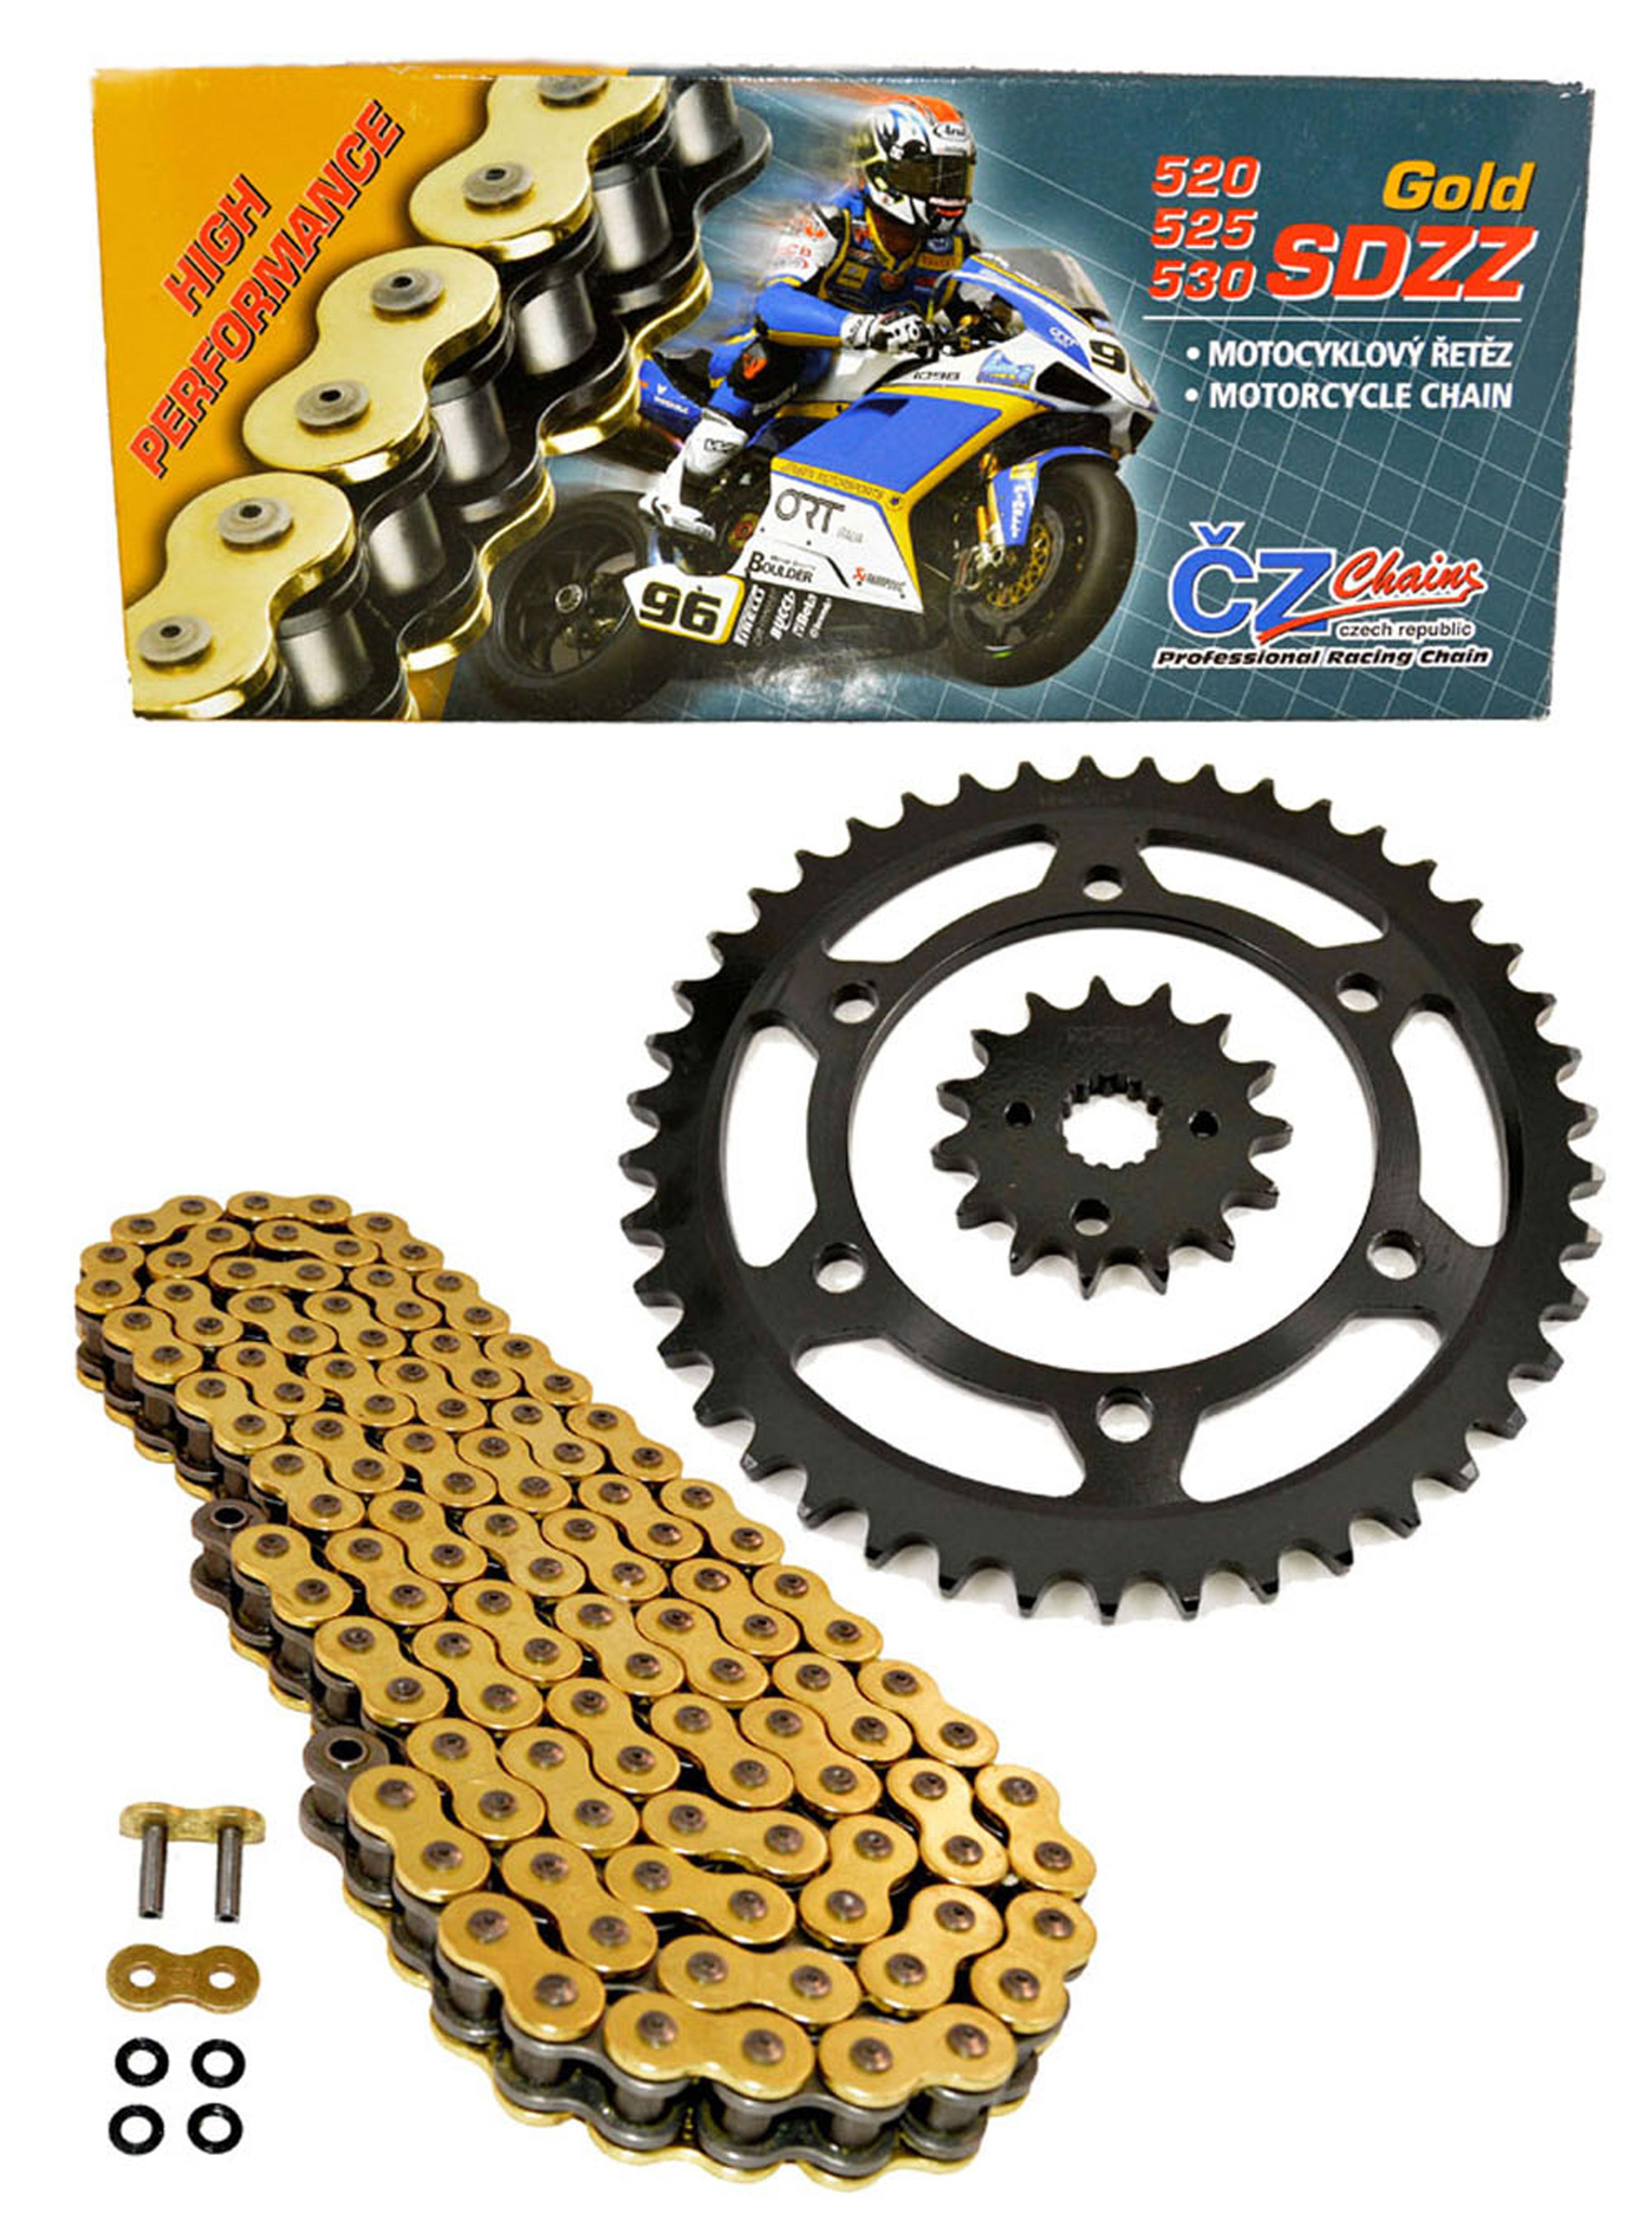 2006-2007 Fits Honda CBR1000RR CZ SDZZ Gold X Ring Chain And Sprocket Kit 16//42 120L